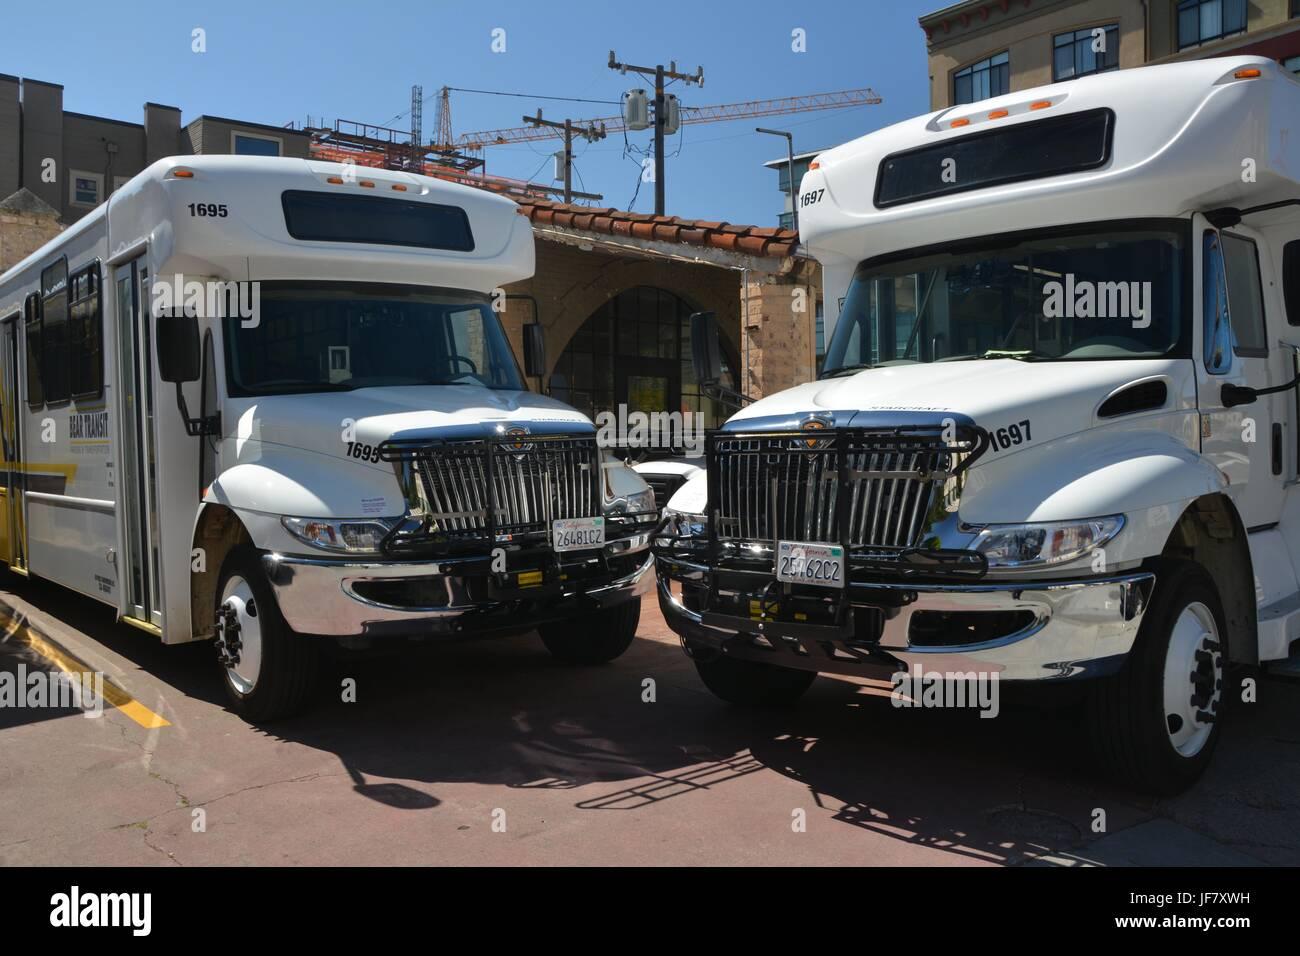 Bear Transit Parking & Transportation in Berkeley on April 30, 2017, California USA - Stock Image